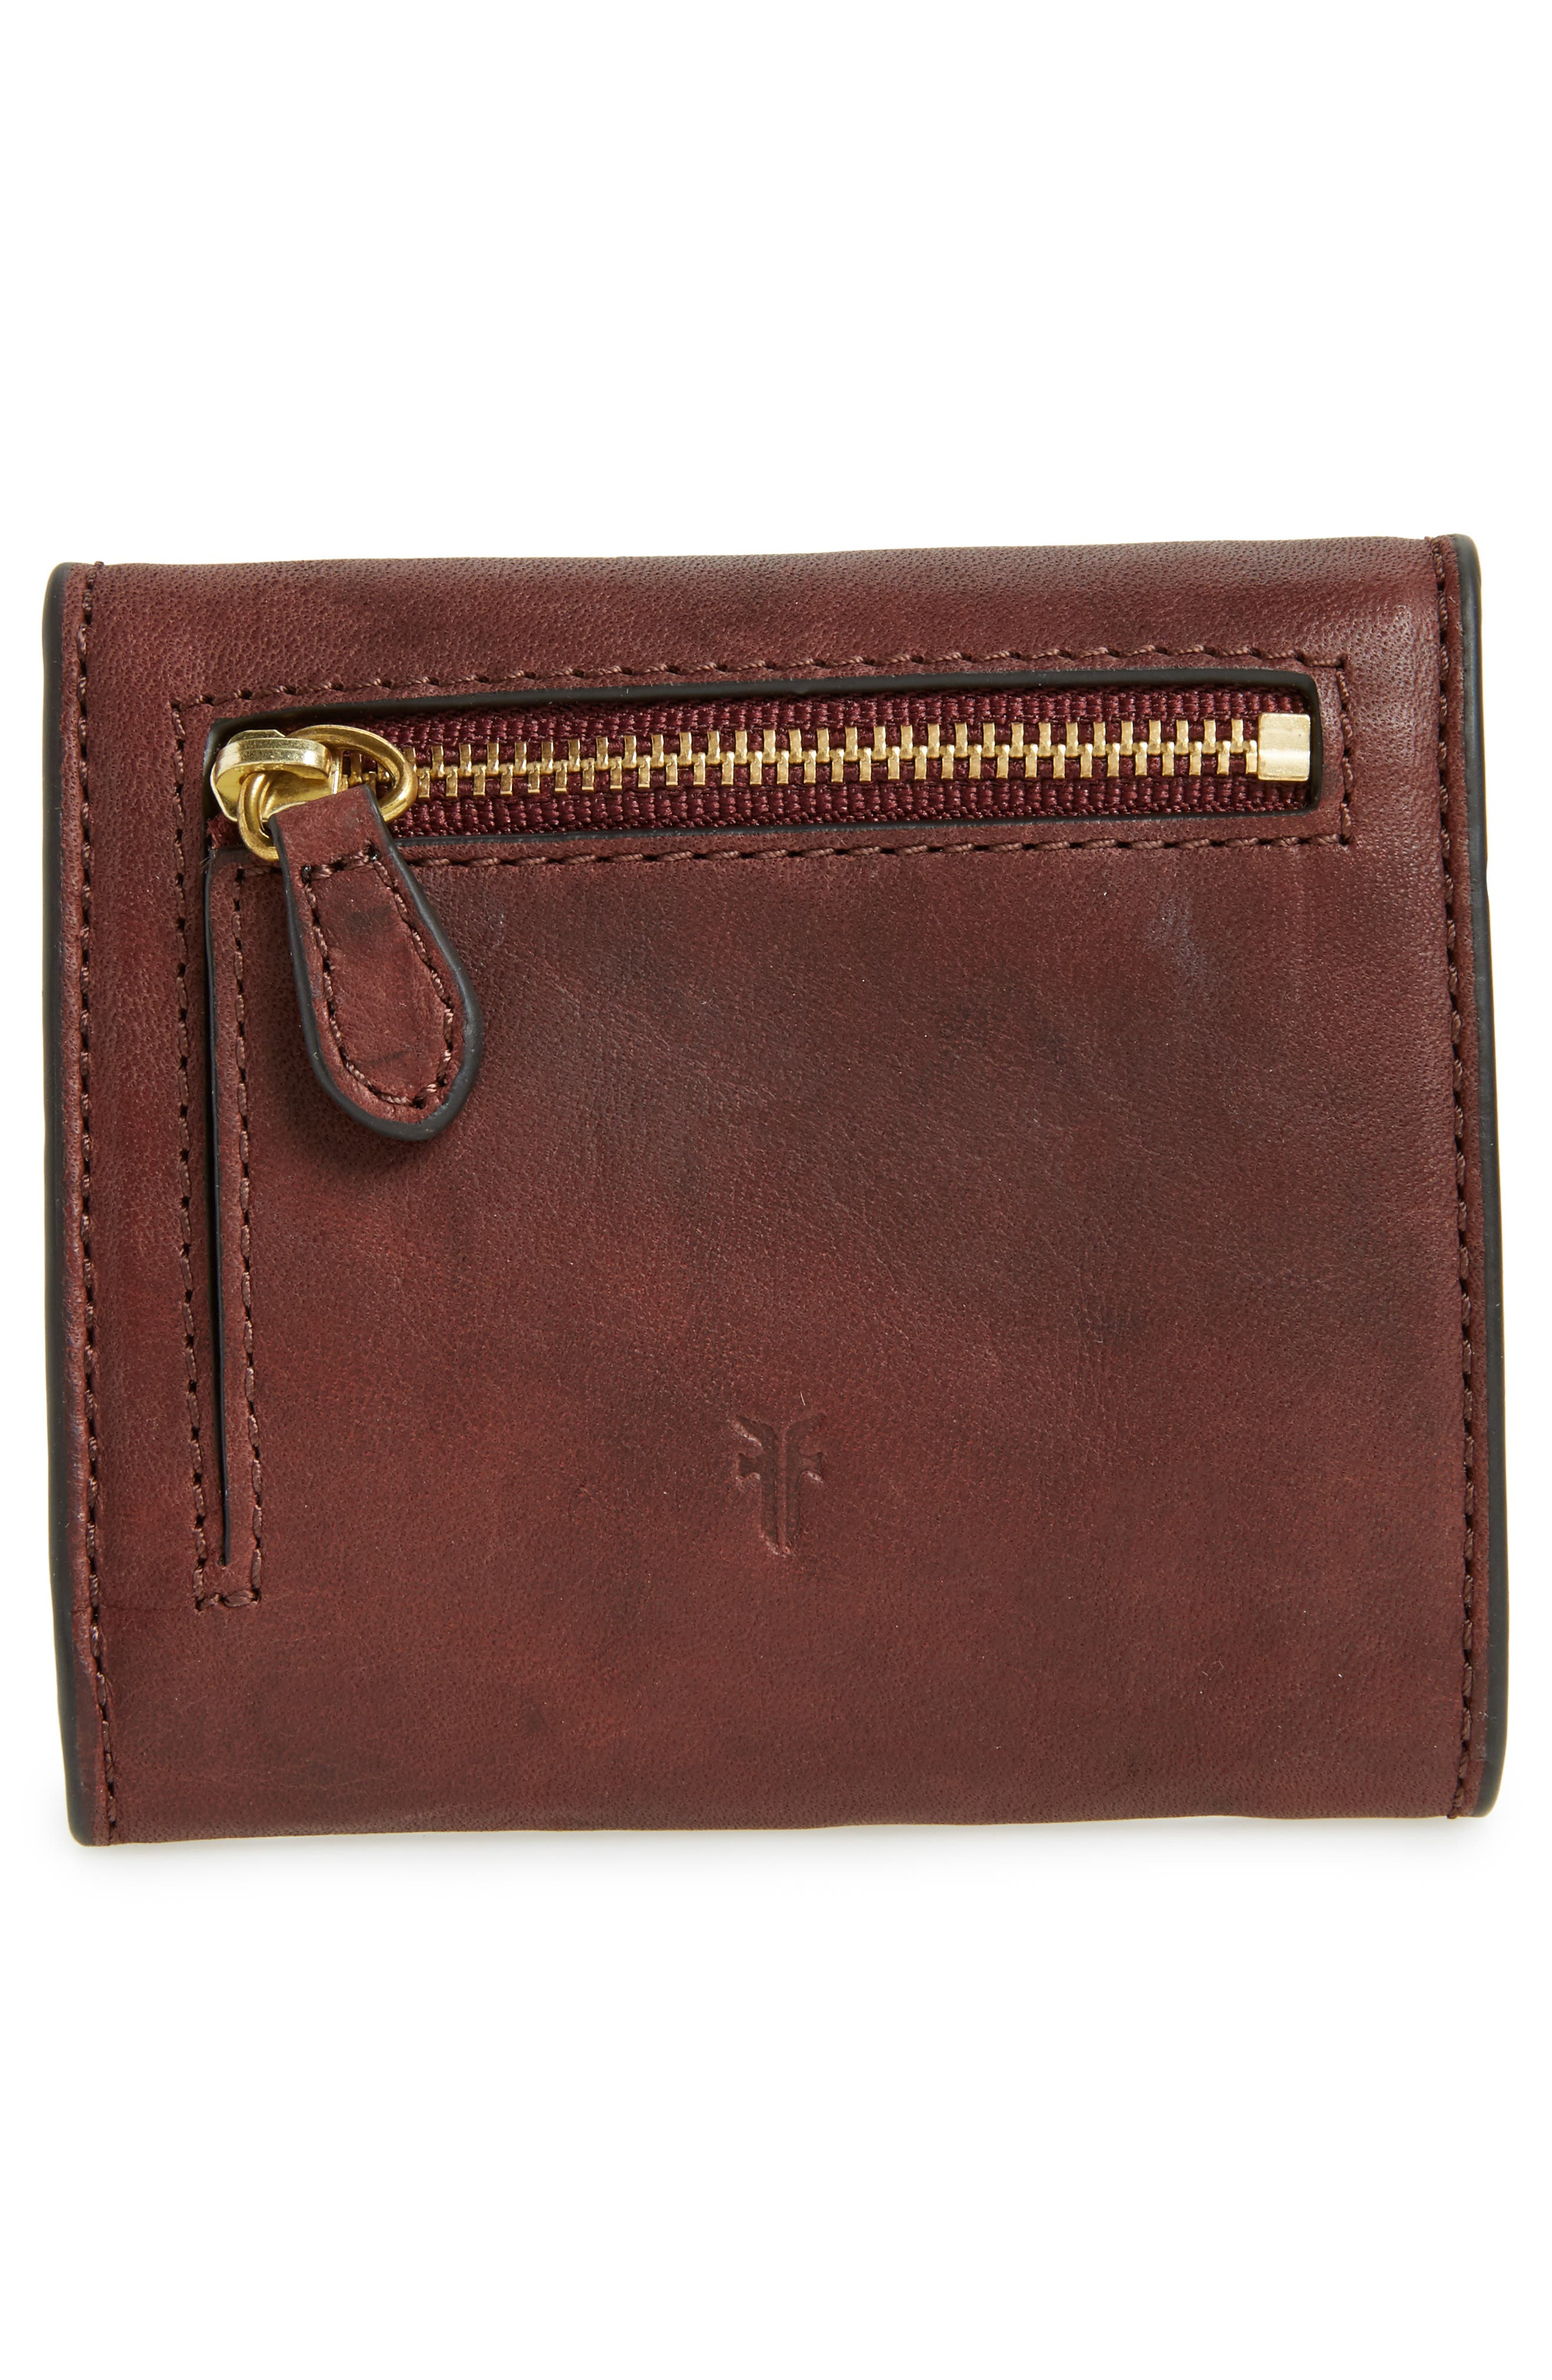 Medium Campus Rivet Leather Wallet,                             Alternate thumbnail 4, color,                             210